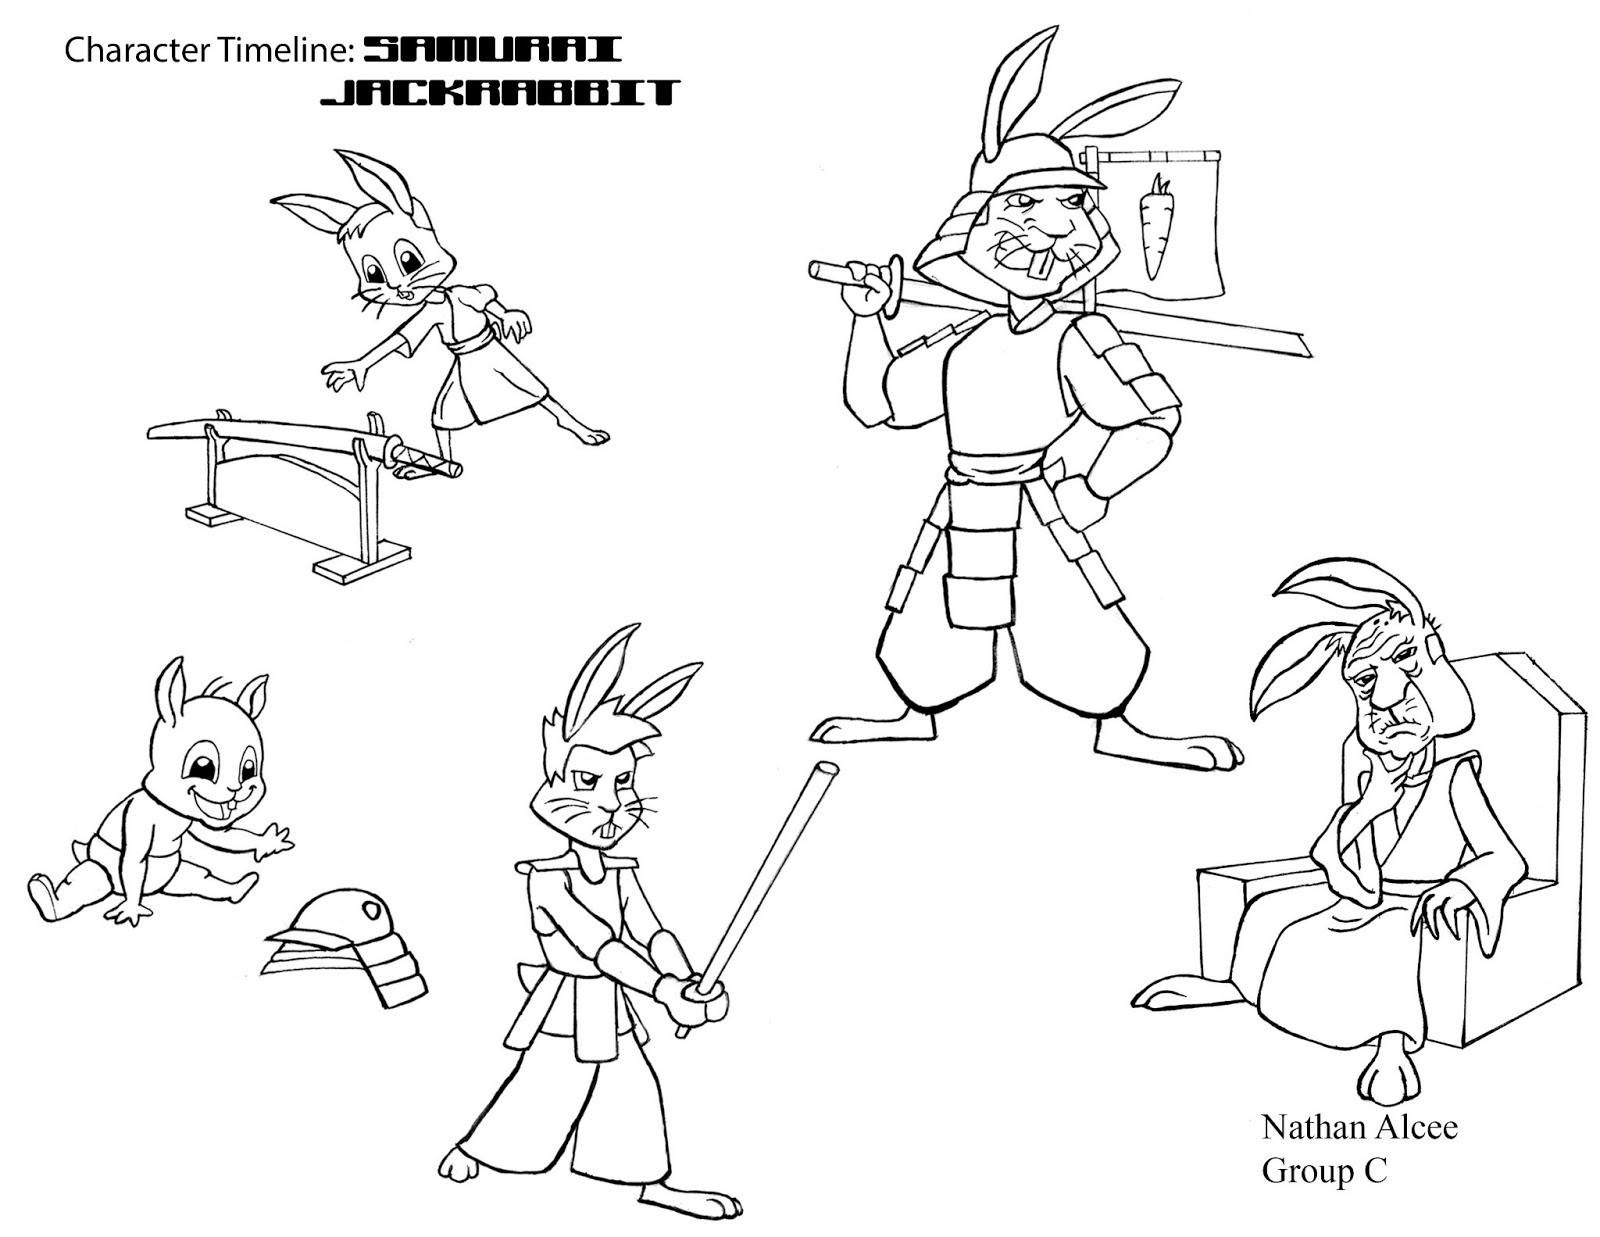 Imaginathan Station: Character Timeline